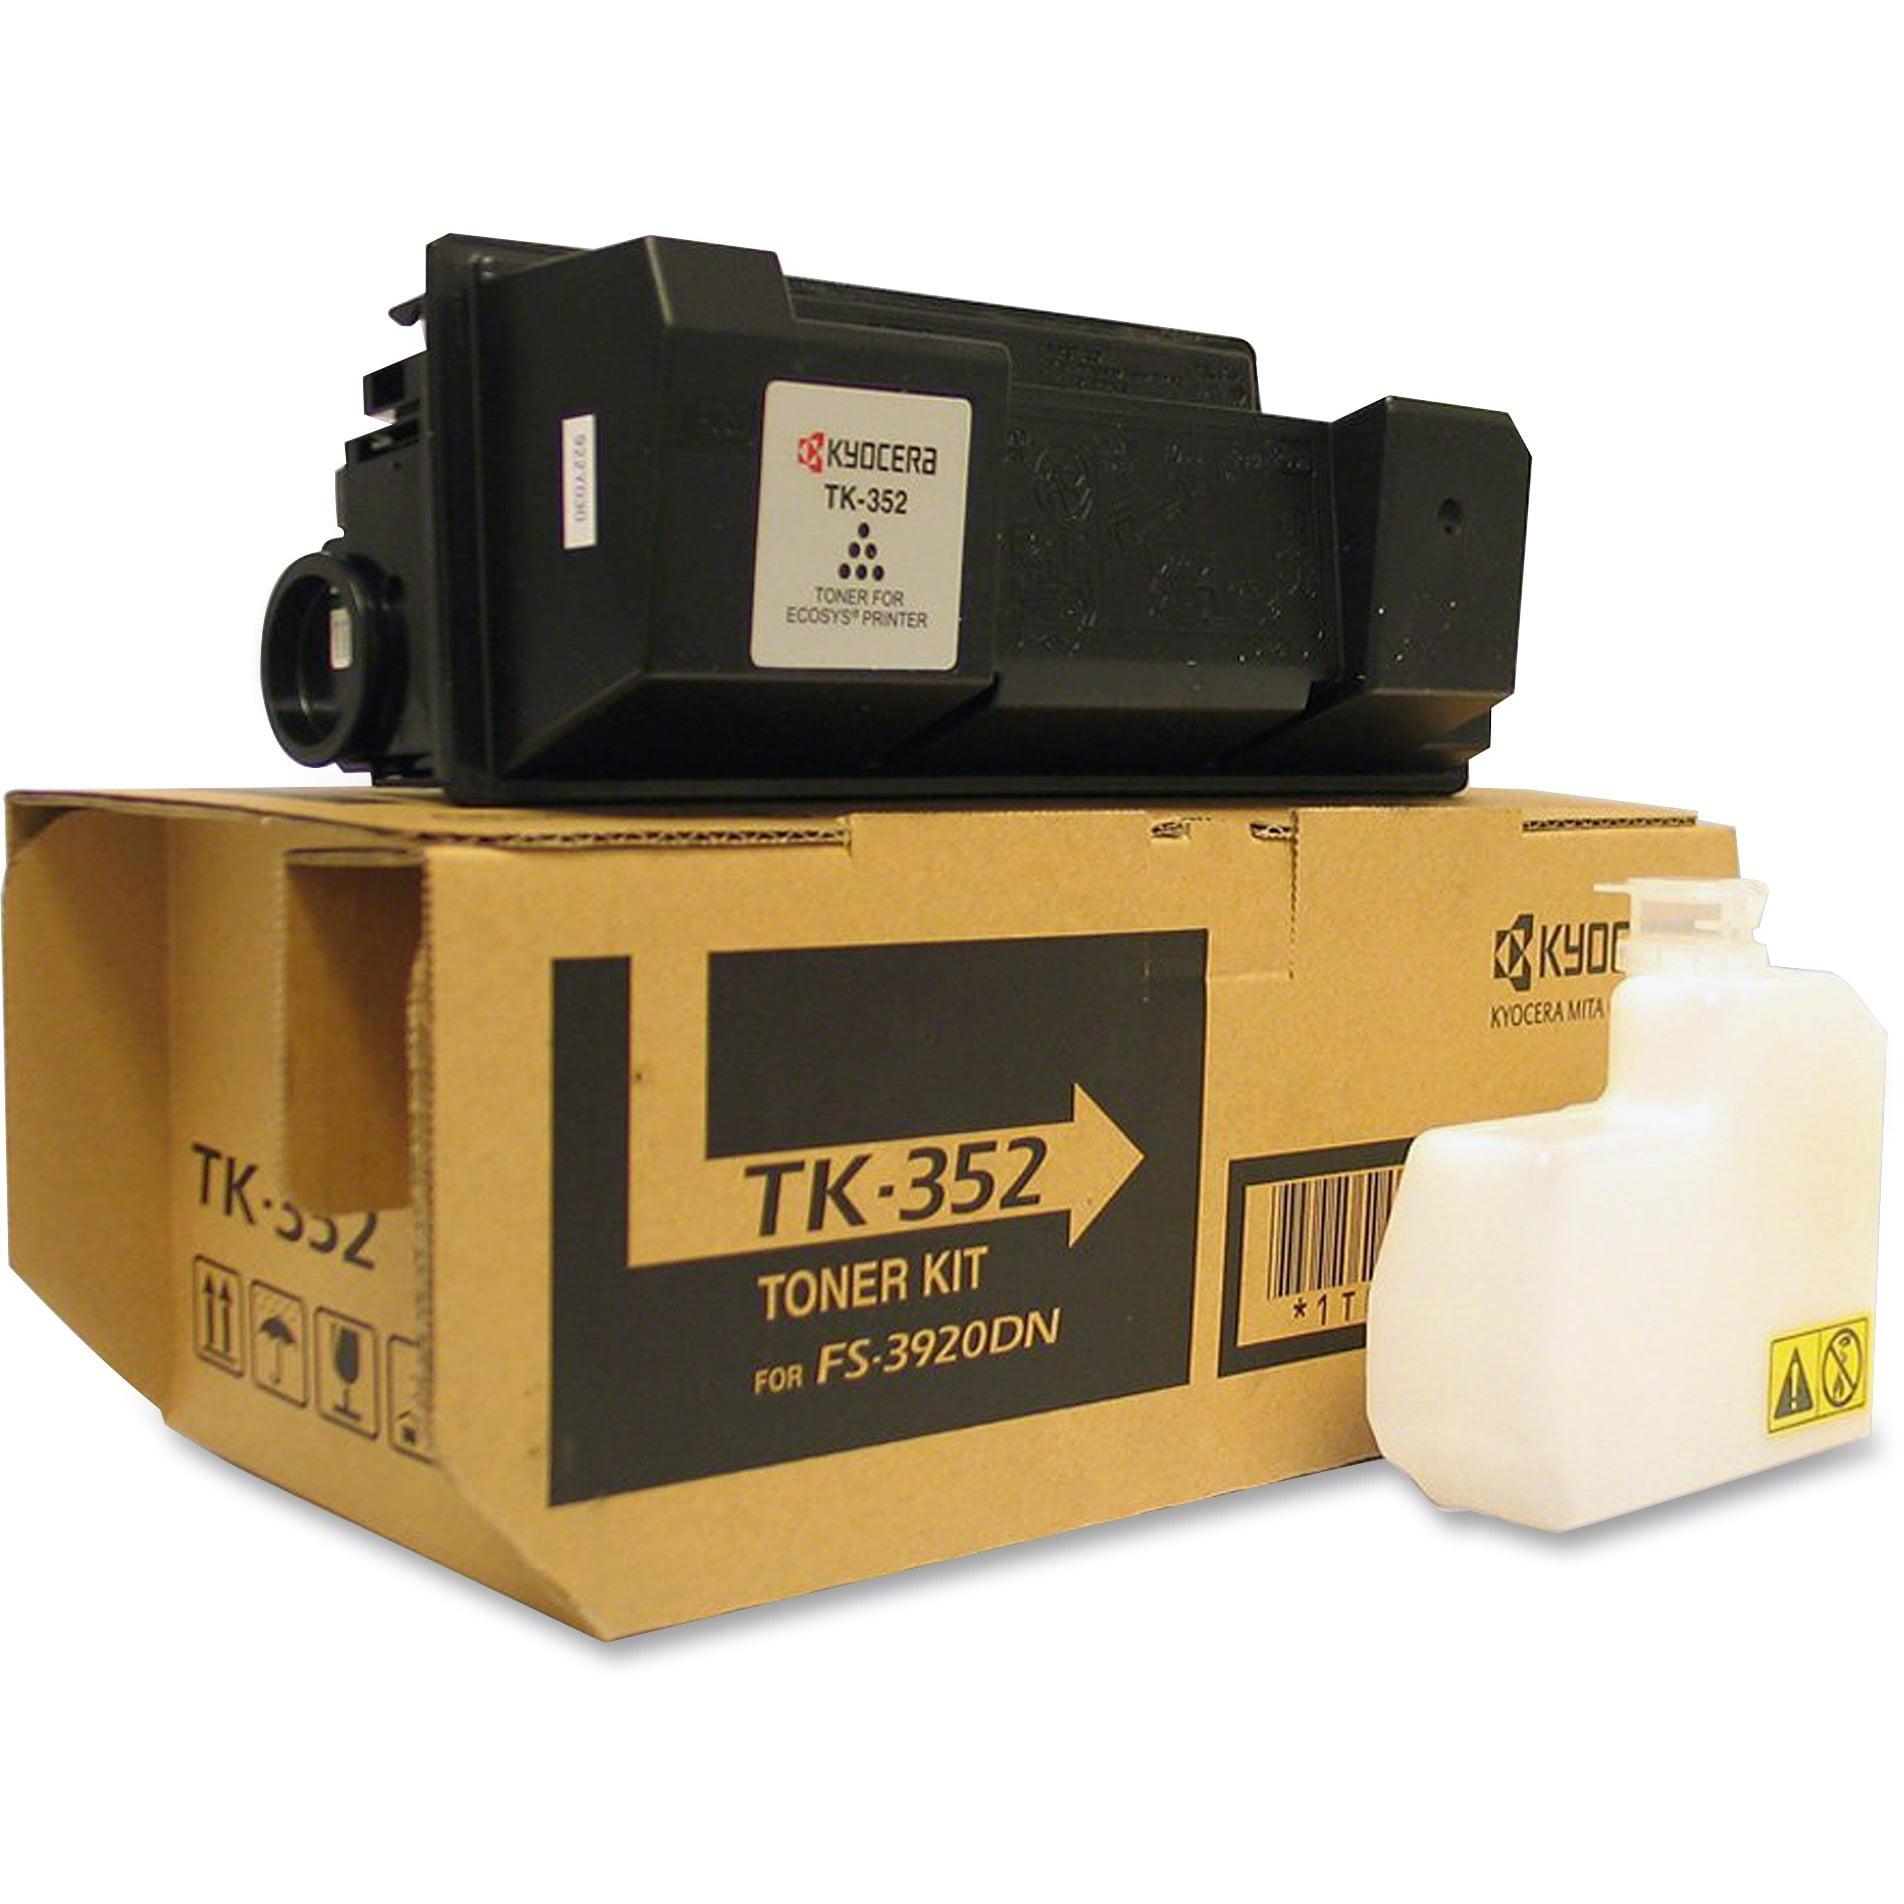 Kyocera, KYOTK352, FS-3920D Toner Cartridge, 1 Each